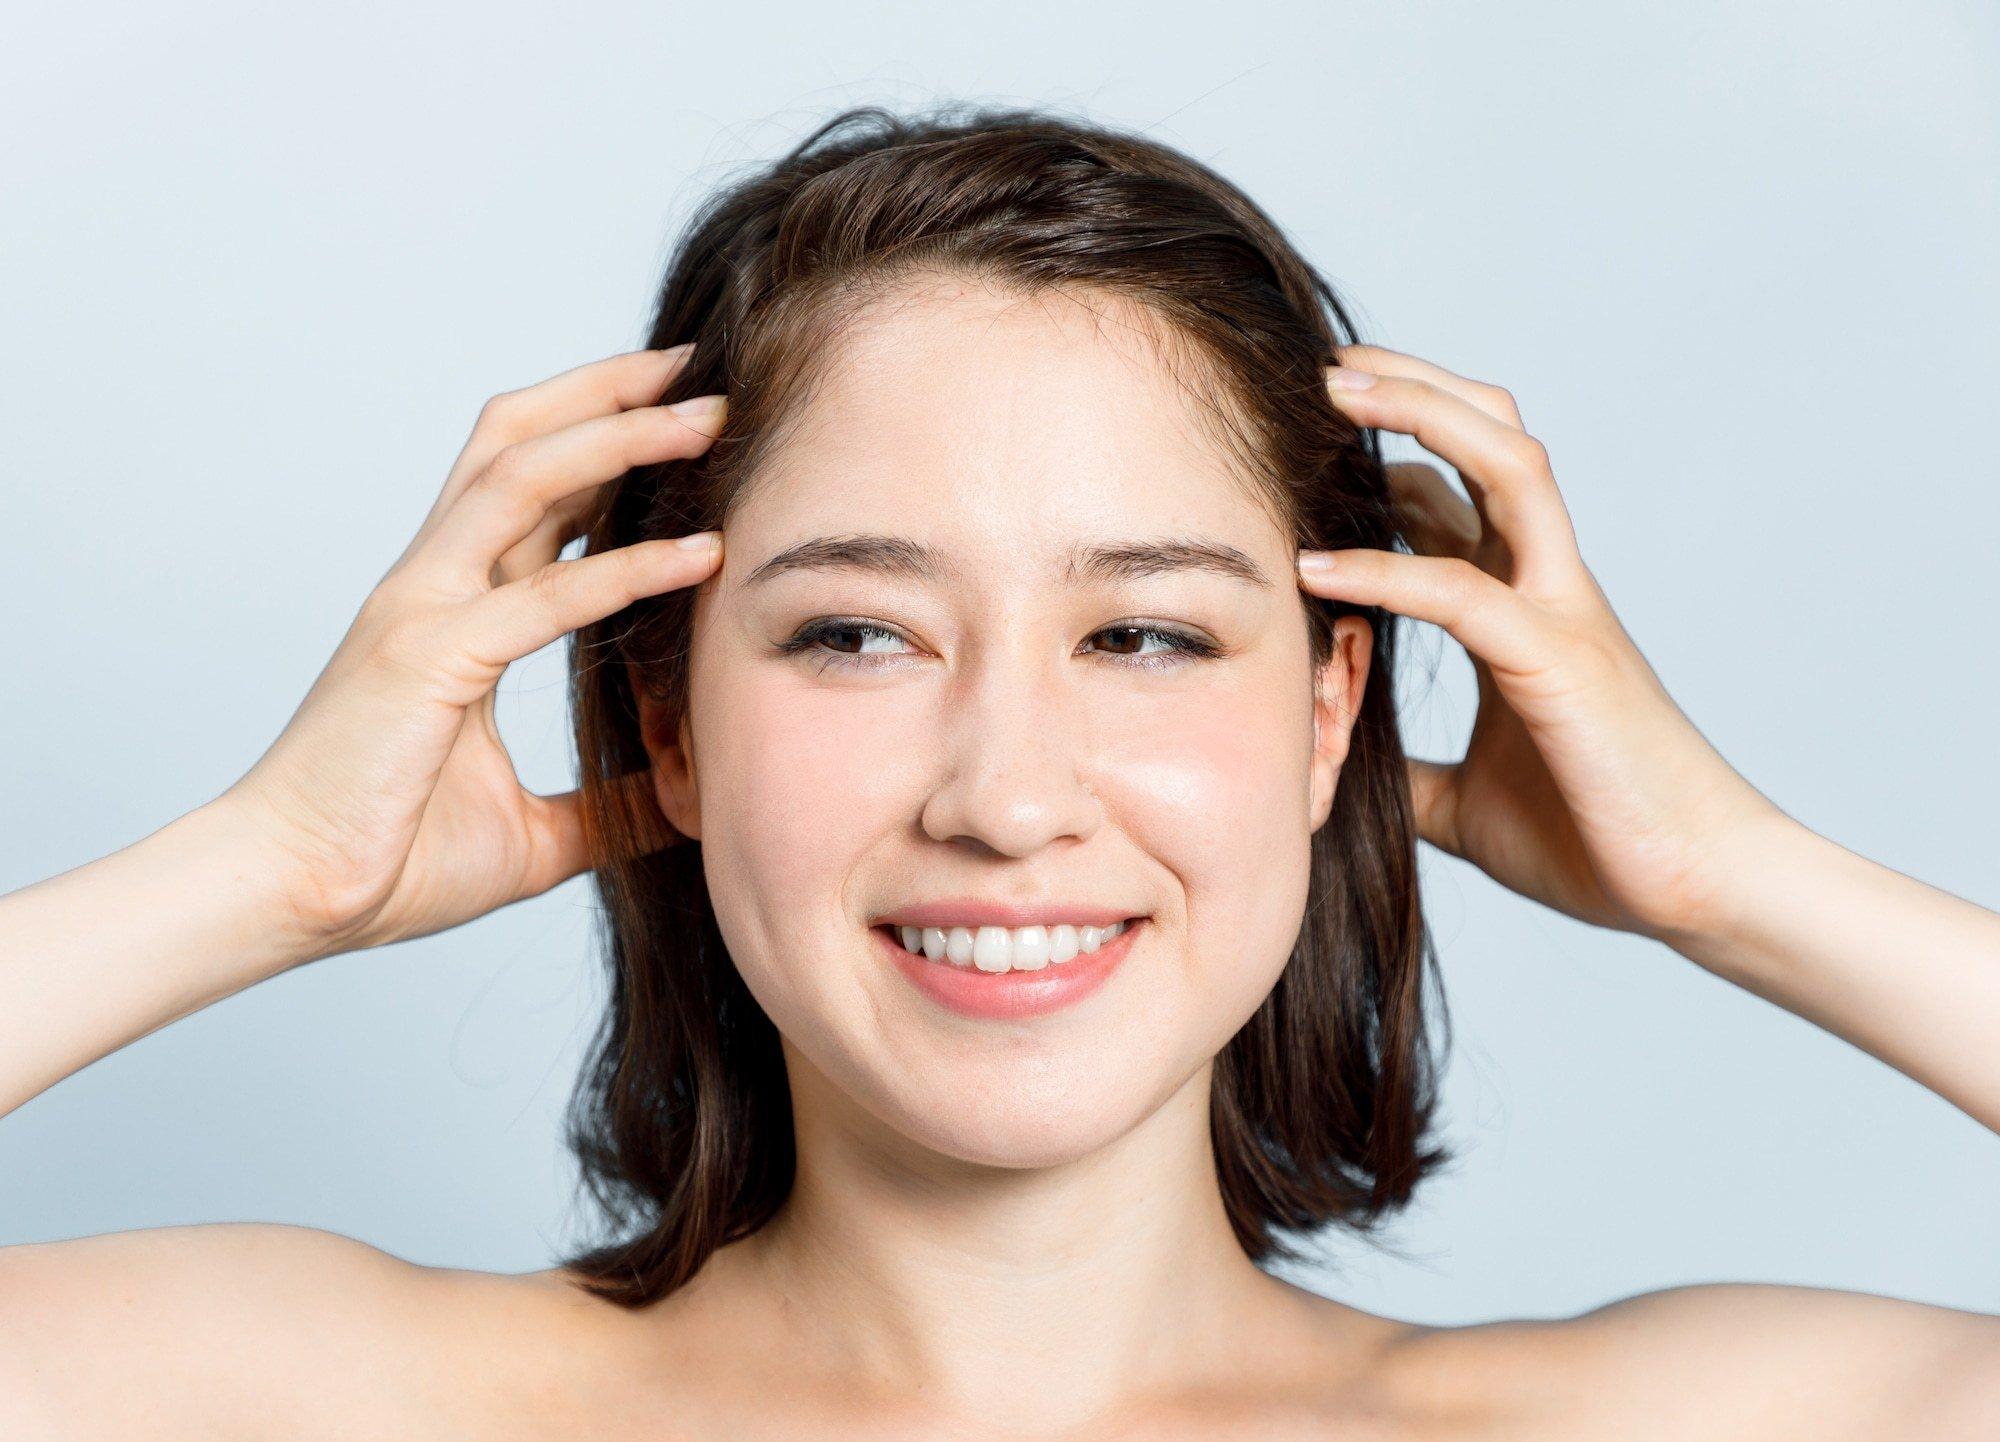 wanita Asia menggaruk kepala